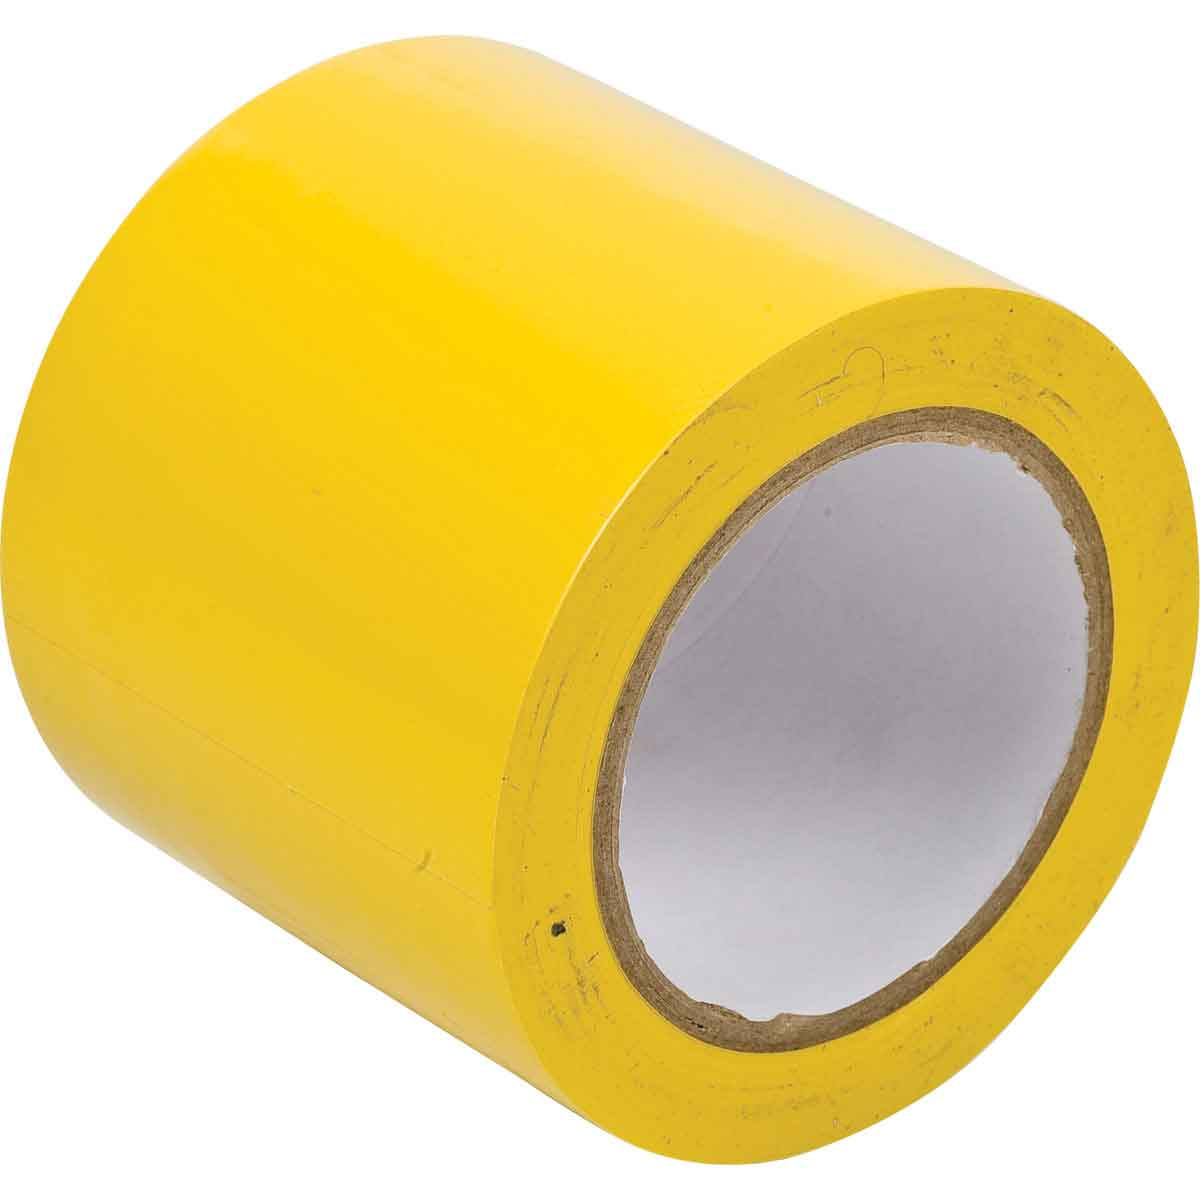 "BRADY 102838 B726 Aisle MarkingTape 4"" Yellow 4"" X 36 YARDS"